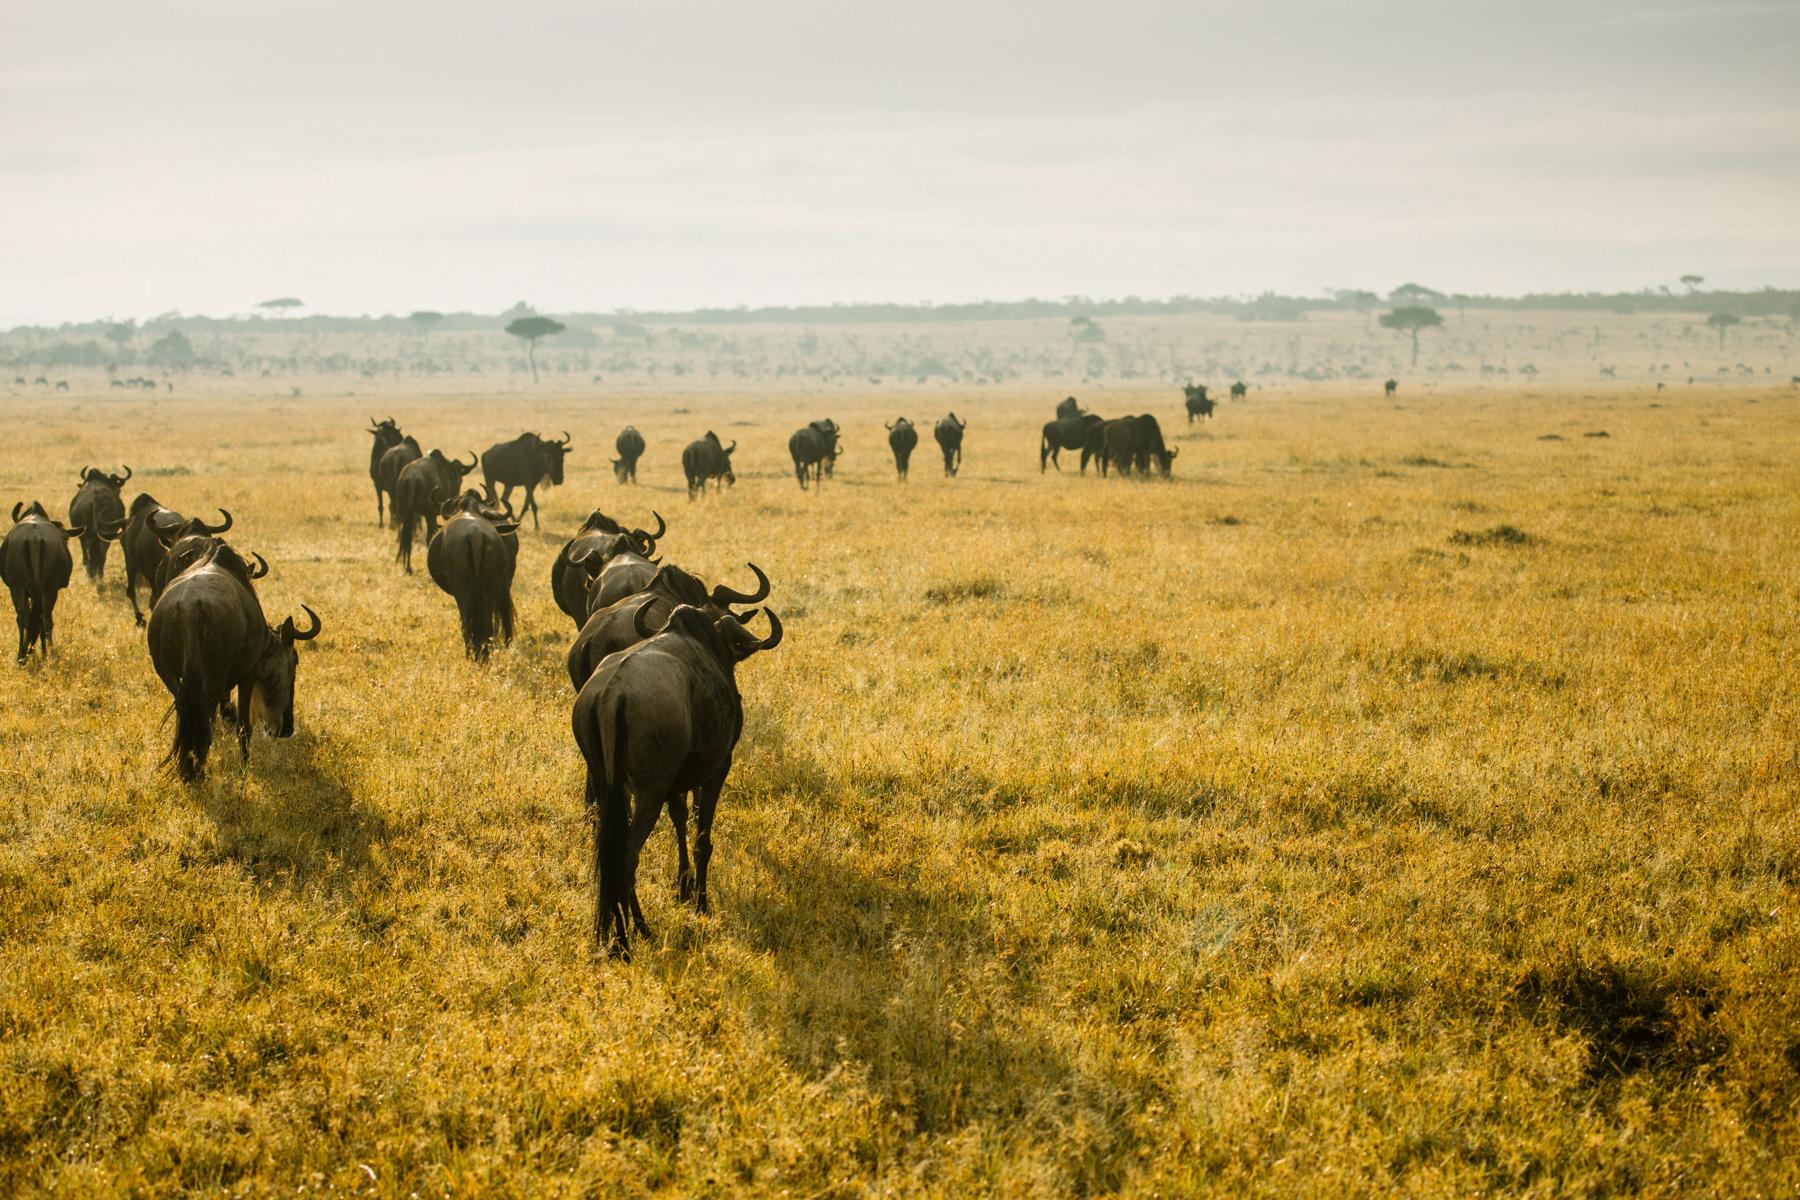 KenyaFeb2019_Safari-72.jpg